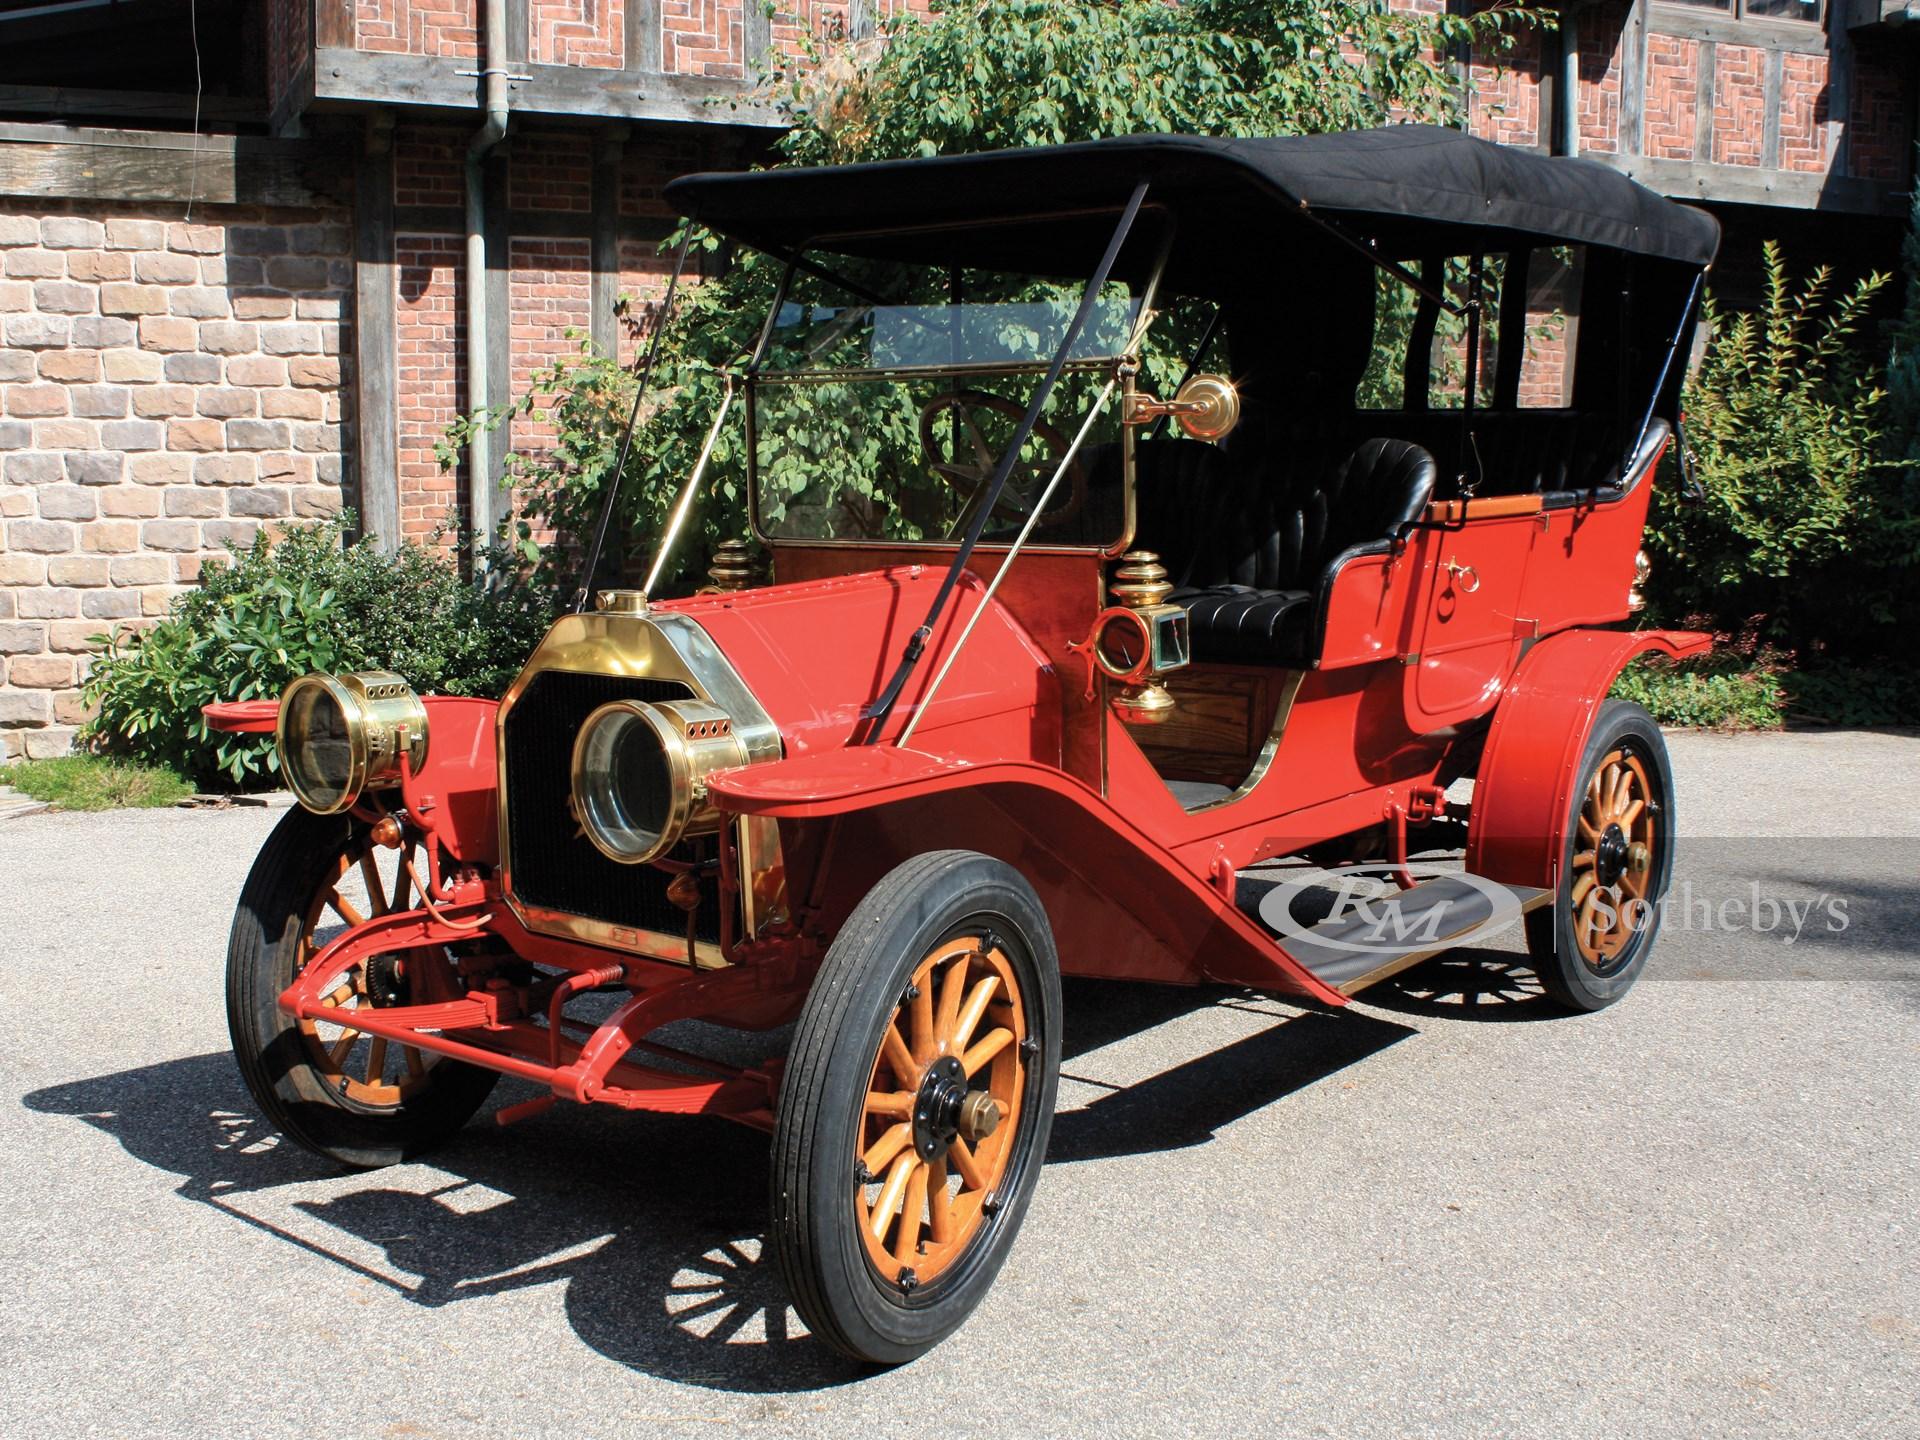 1910 Overland Model 42 Five-Passenger Touring